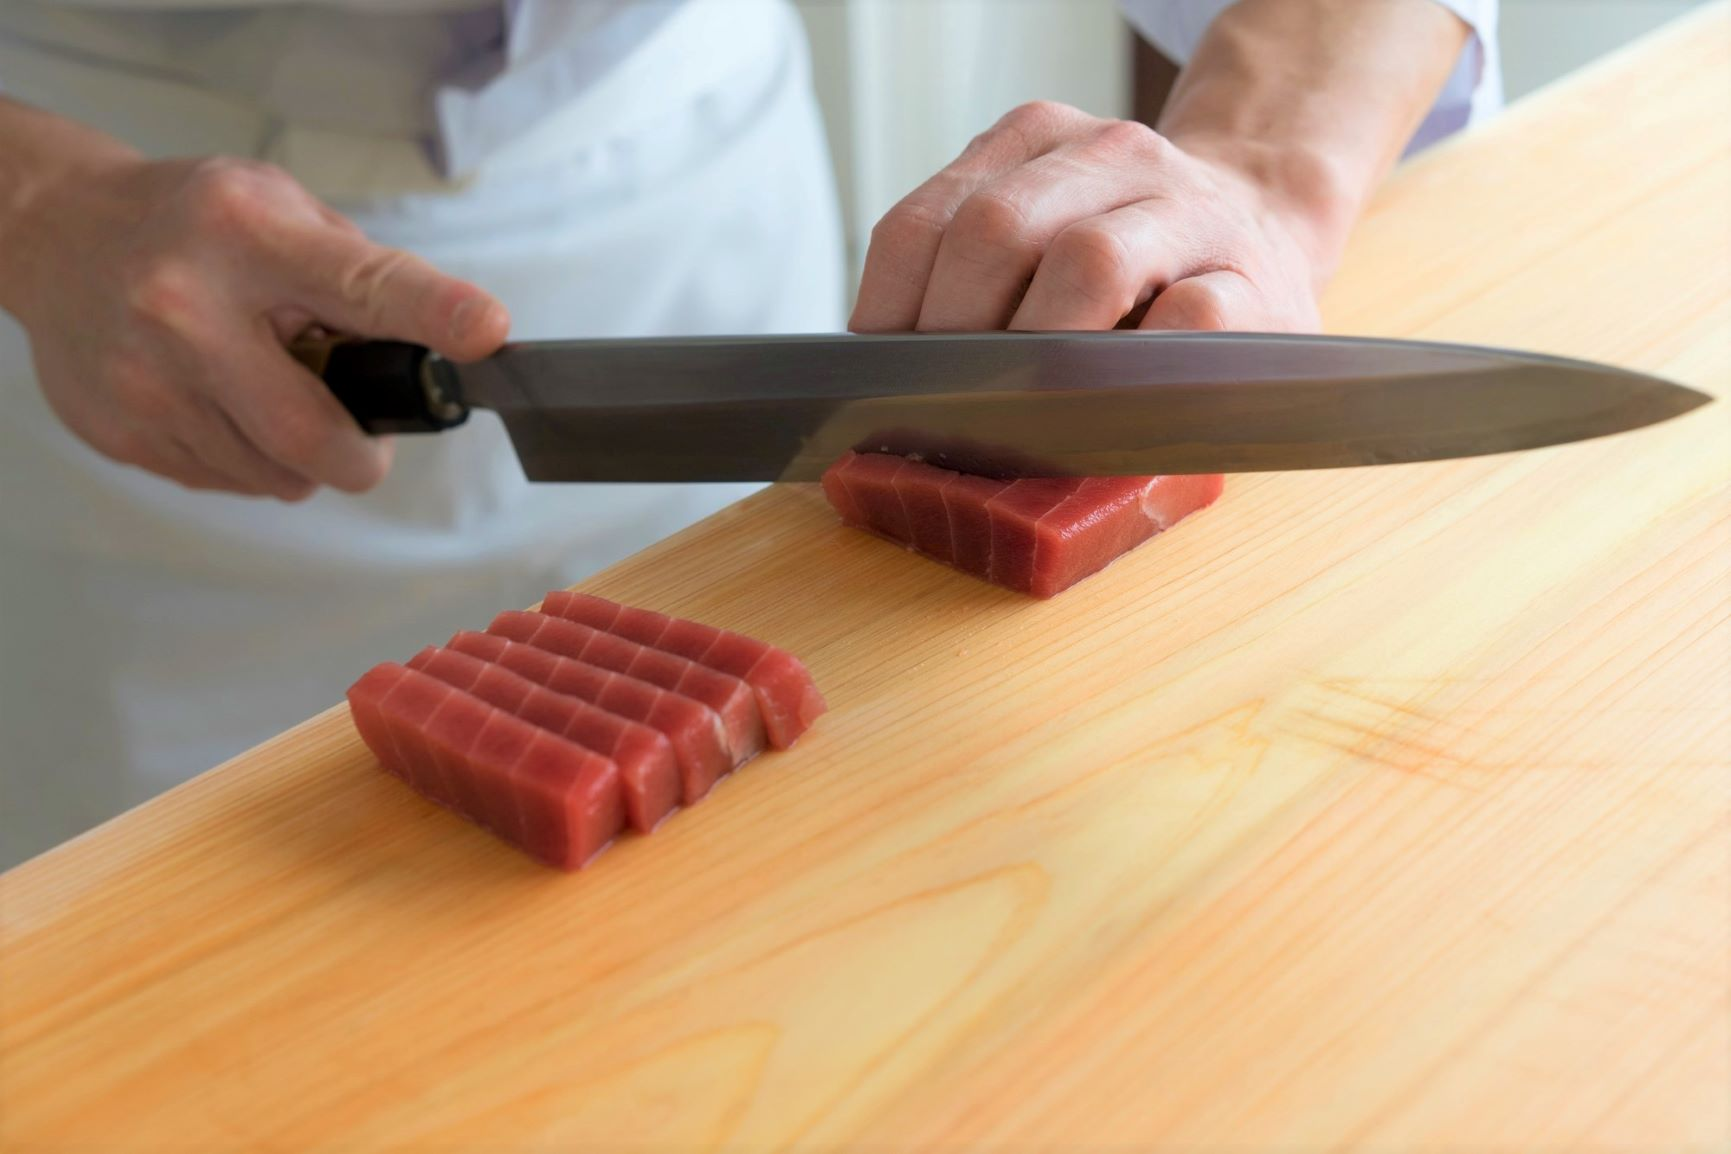 Japanese Cuisine Online Masterclass